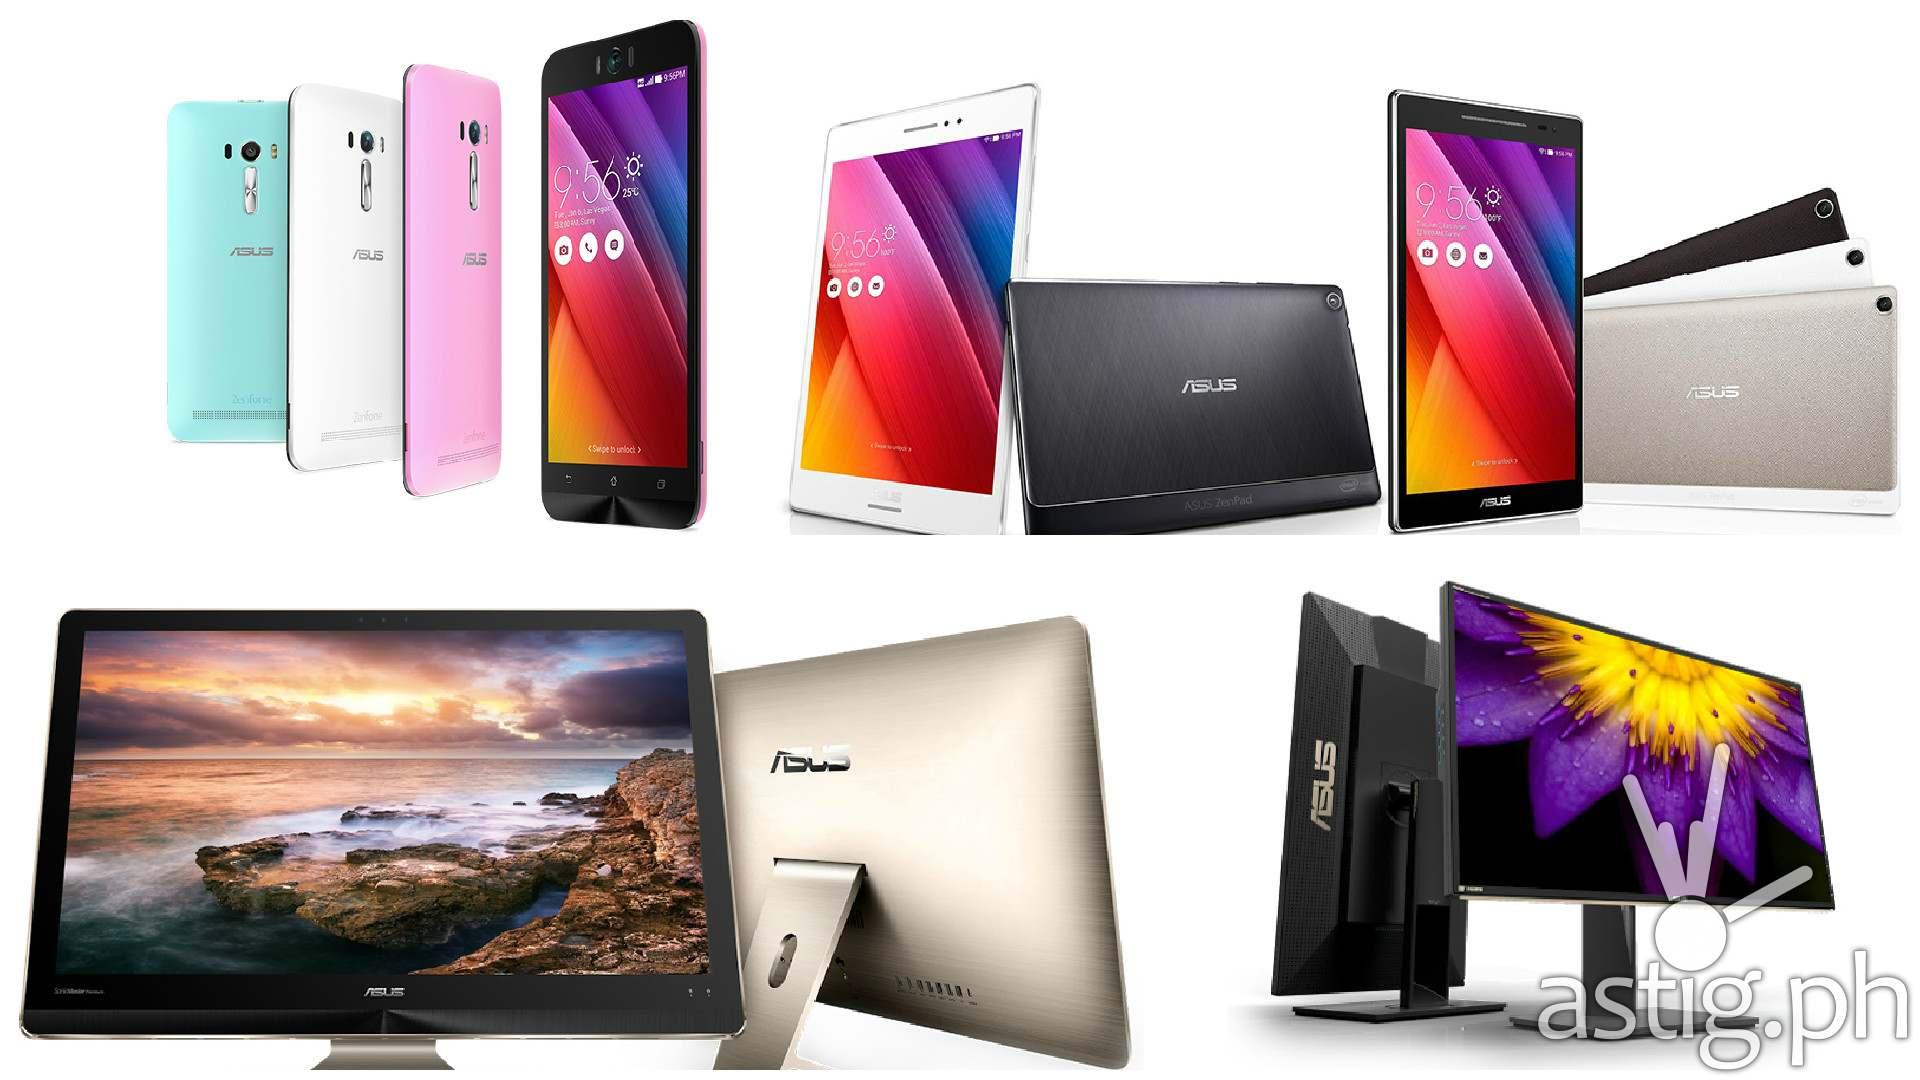 ASUS ZenPad 8, ASUS Zenfone Selfie, ASUS Zen Aio, ASUS ProArt PA329Q 4K at Computex